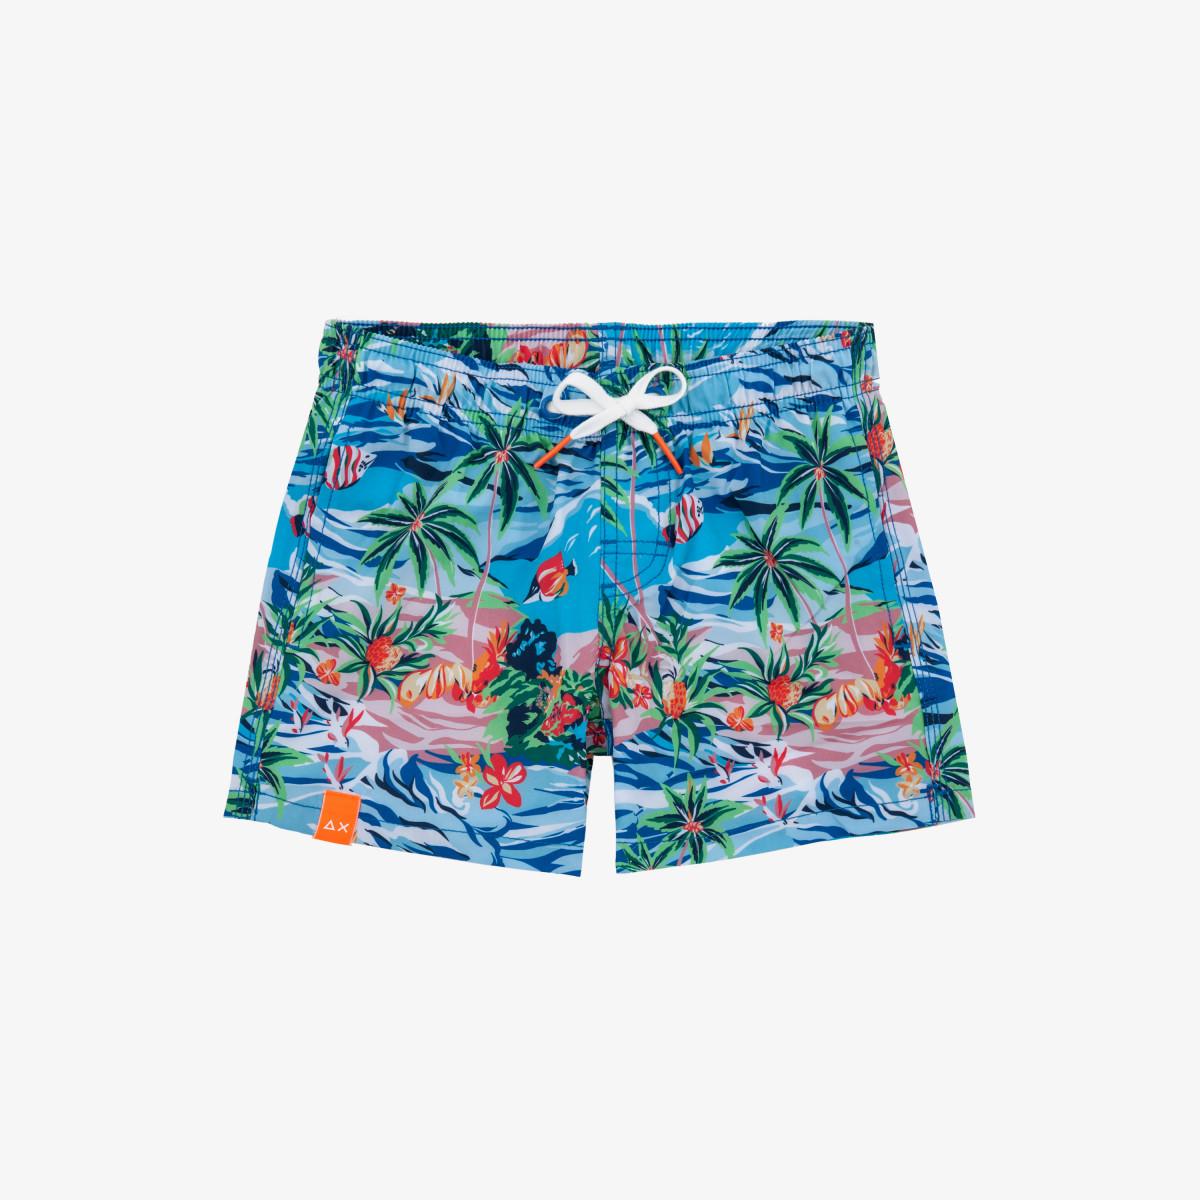 BOY'S SWIM PANT MICRO HAWAII BLUE